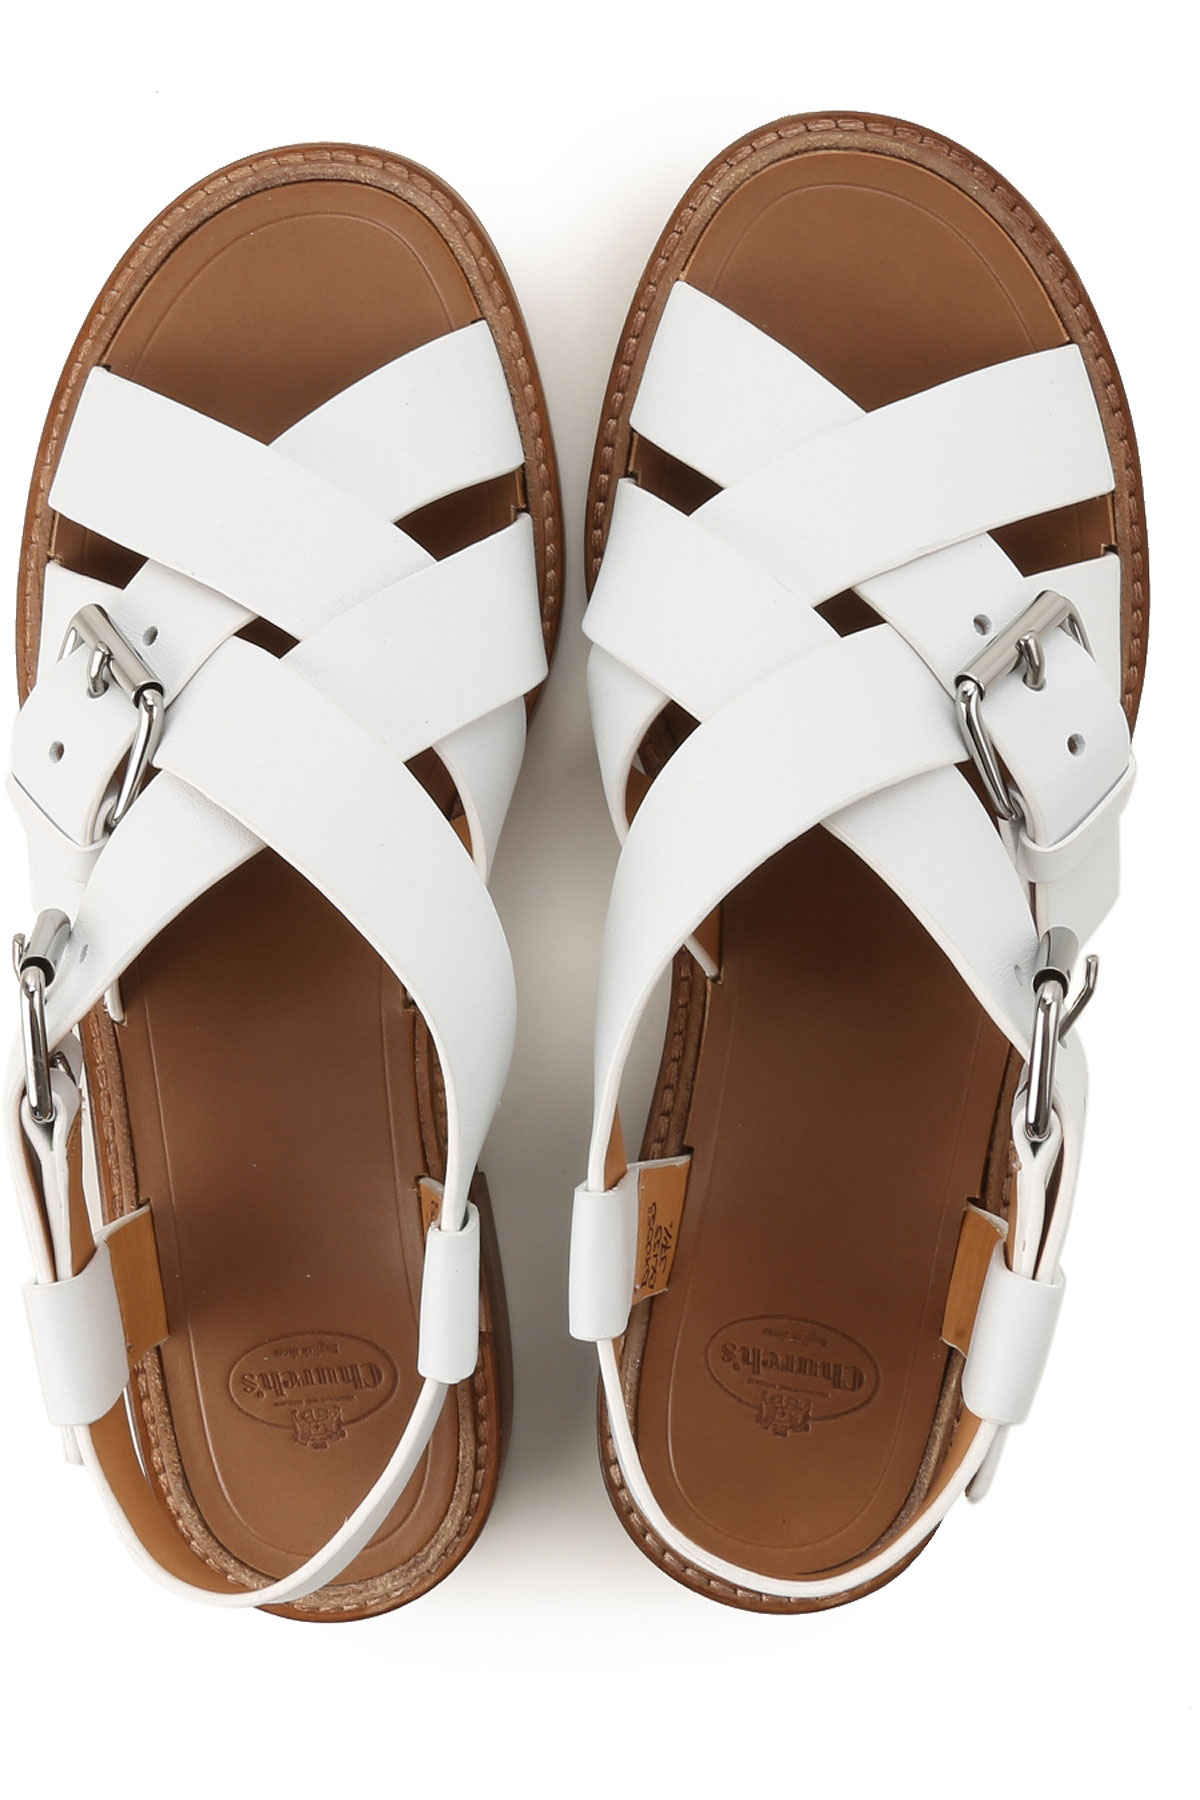 Primavera Zapatos verano Church's Para Mujer 2019 Blanco nbsp; q1xF6HFwt